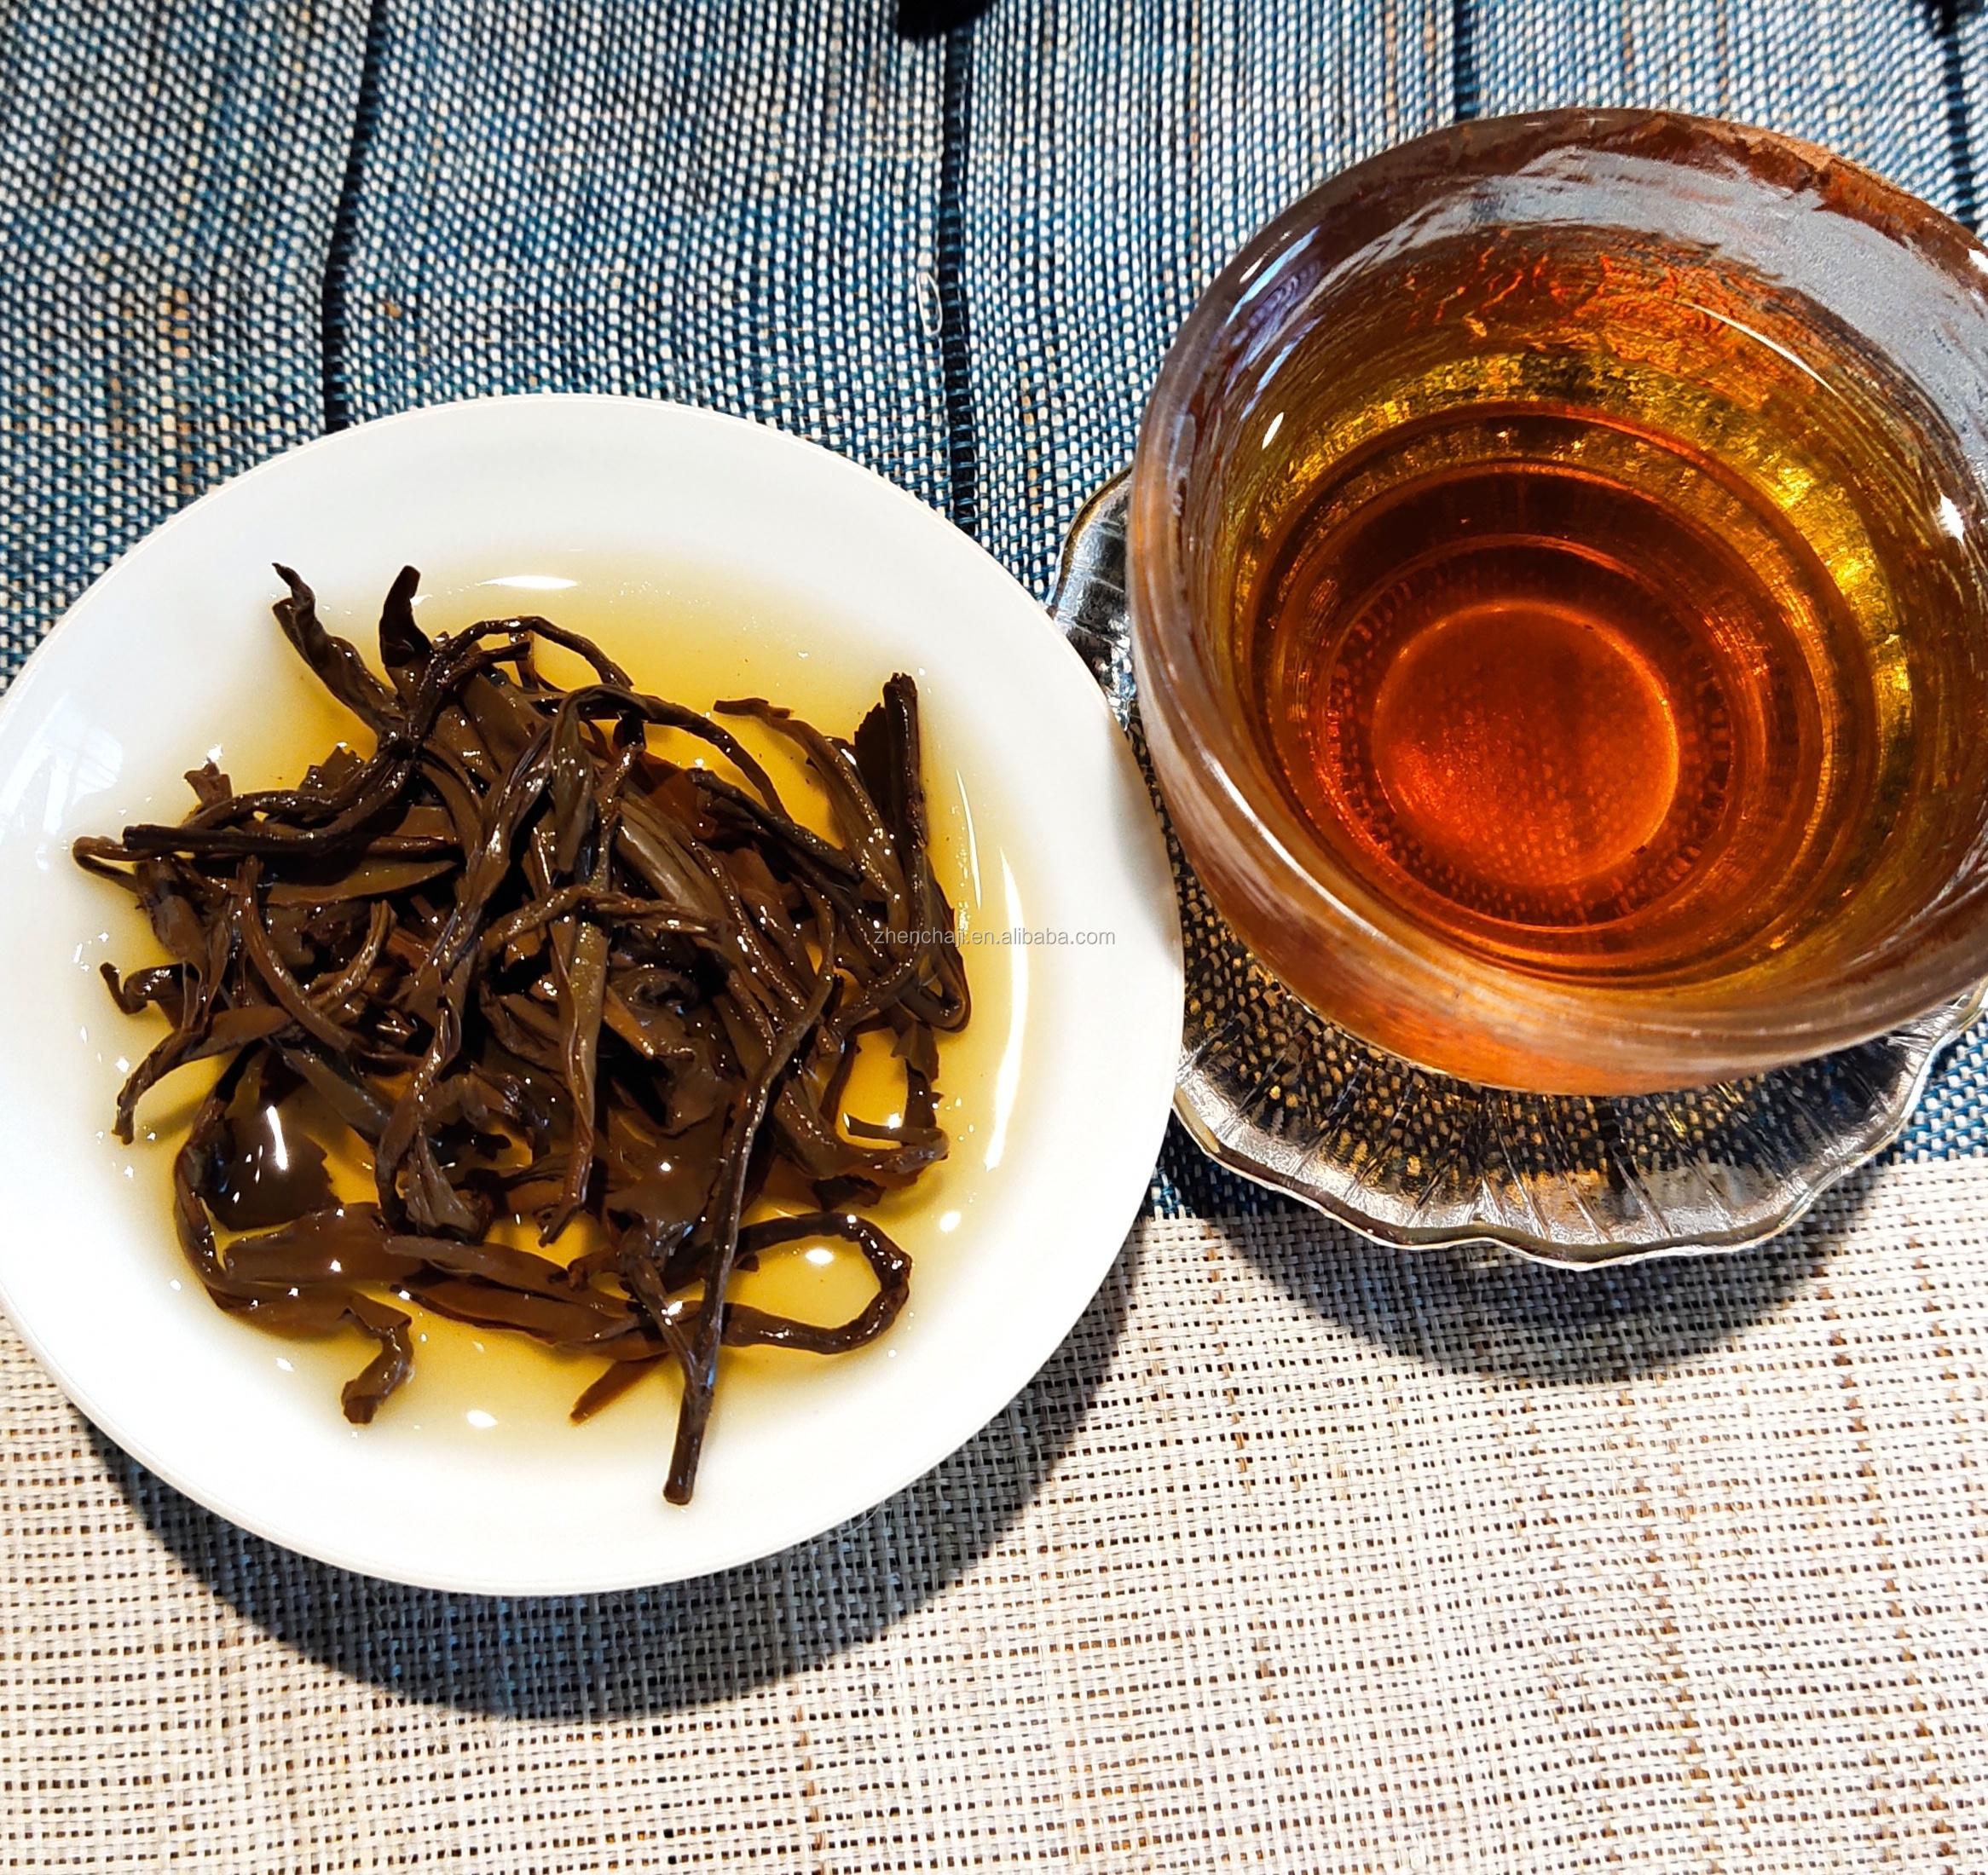 1000g Wholesale factory supplied healthy organic yunnan black tea - 4uTea | 4uTea.com